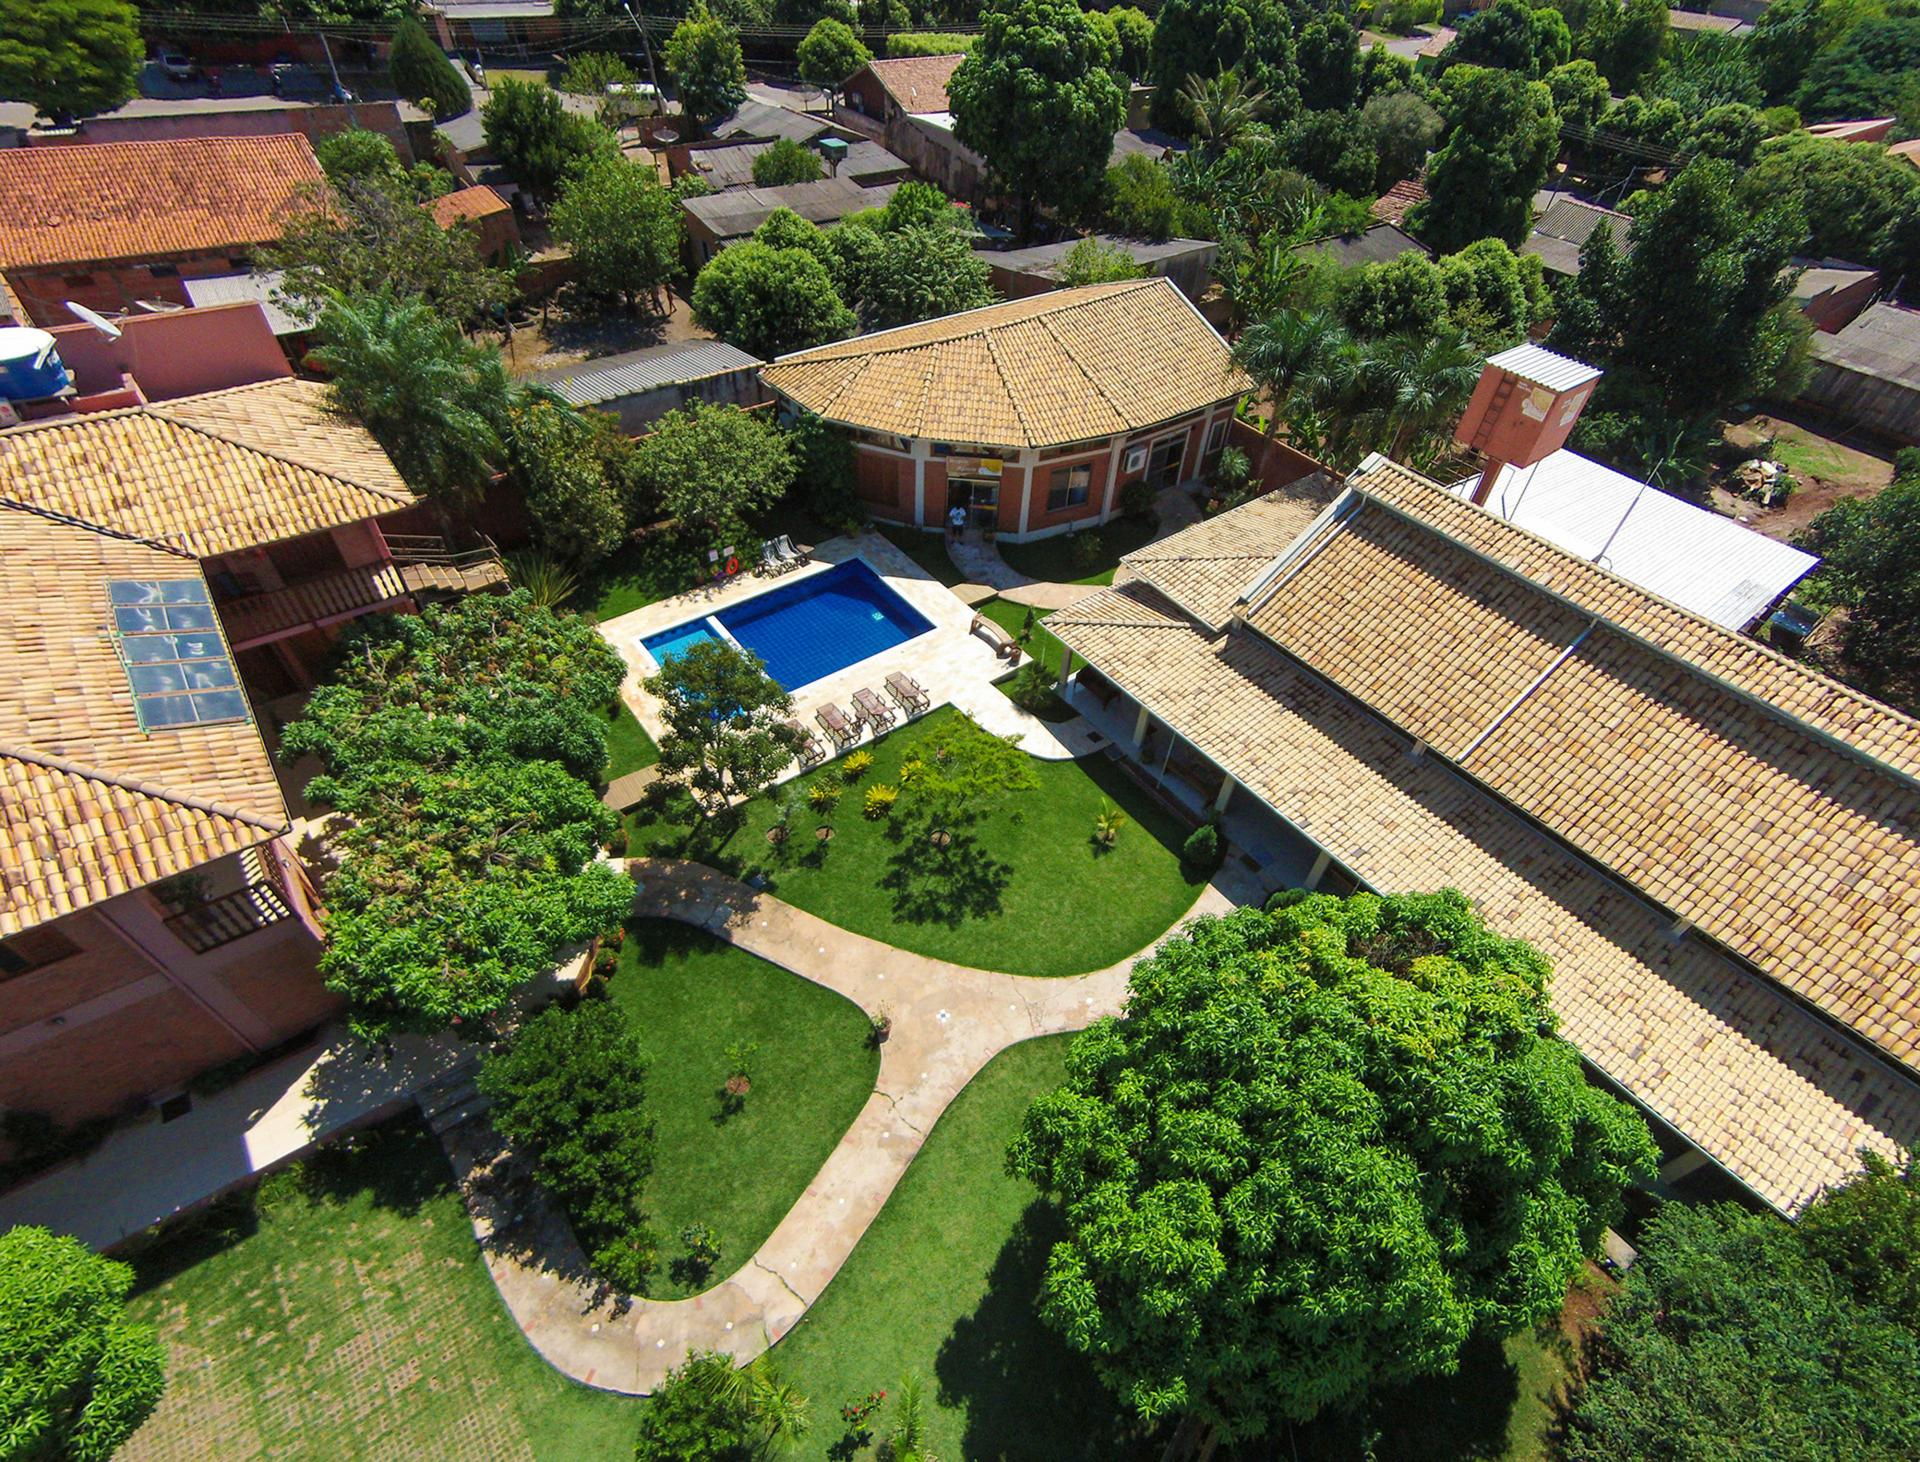 Luftaufnahme der Pousada Galeria Artes in Bonito, Brasilien